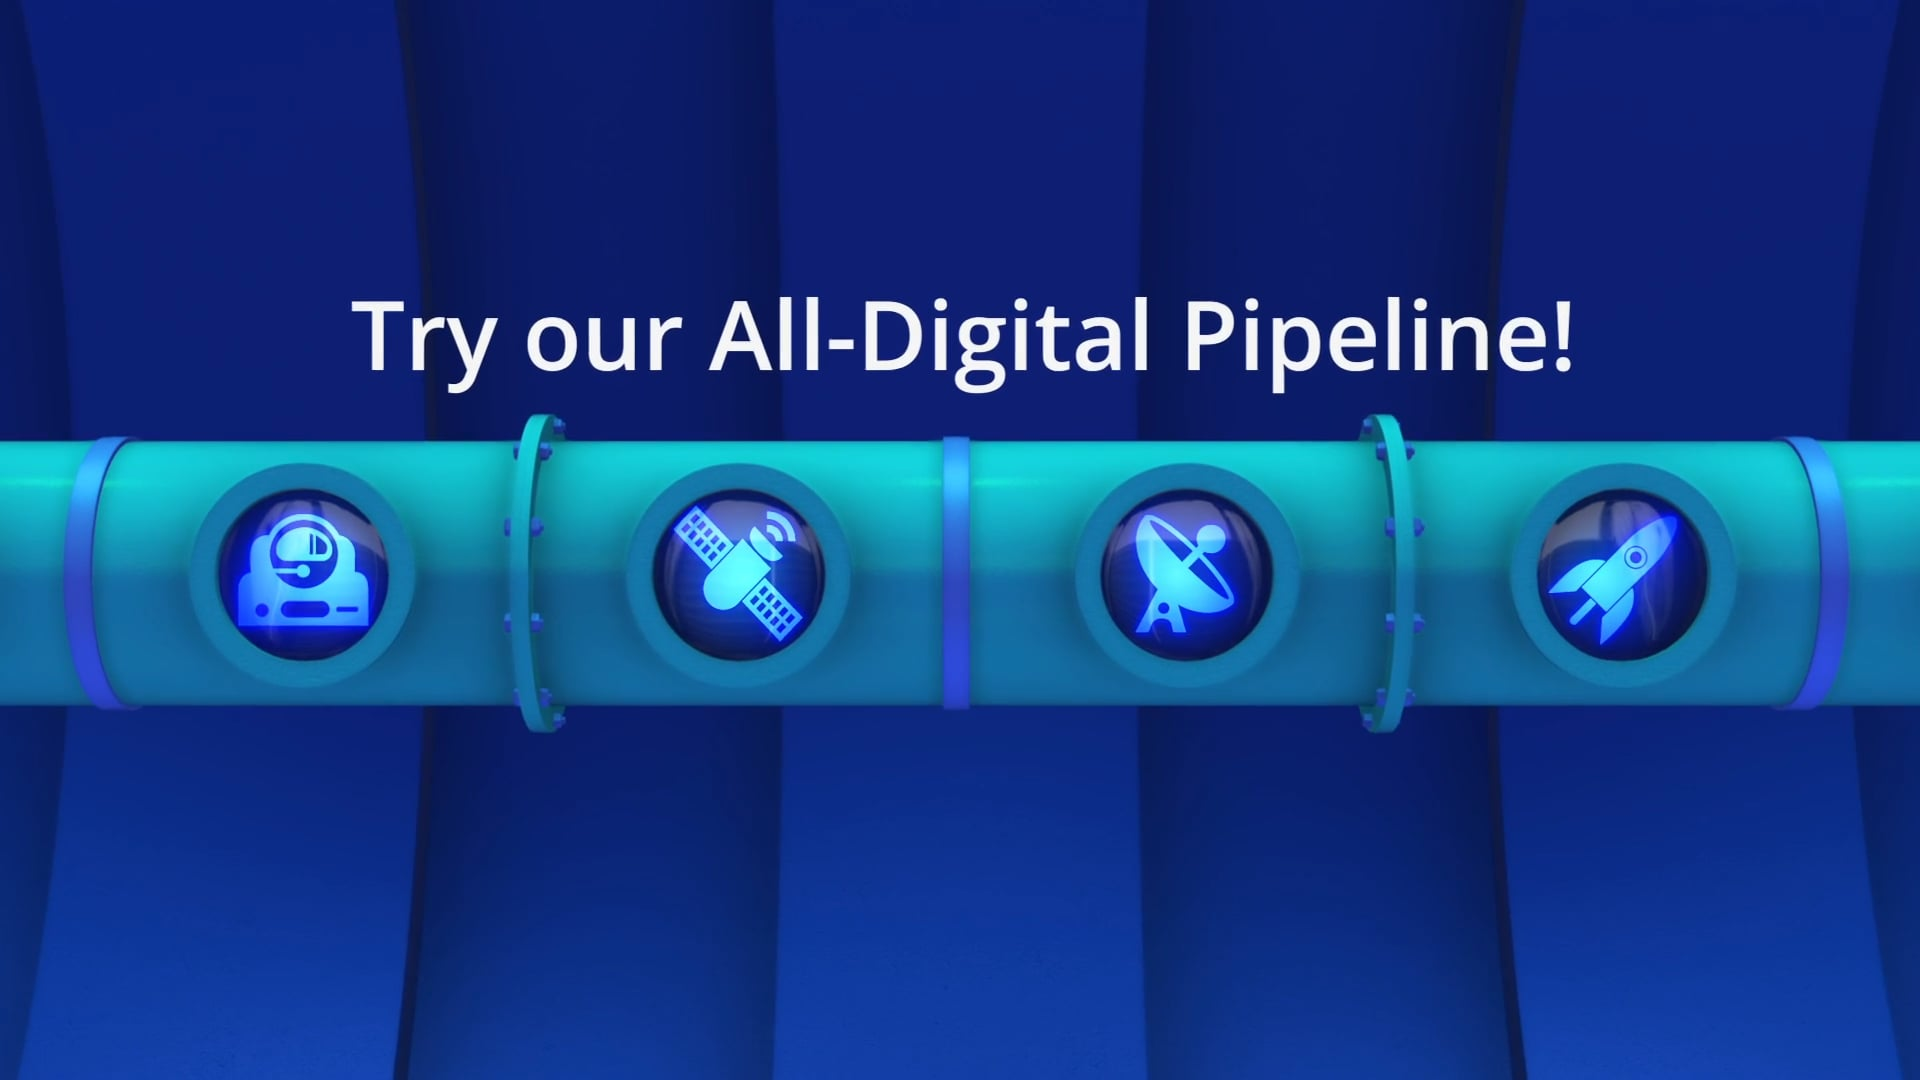 All-Digital Pipeline - Pixel Planet Studios